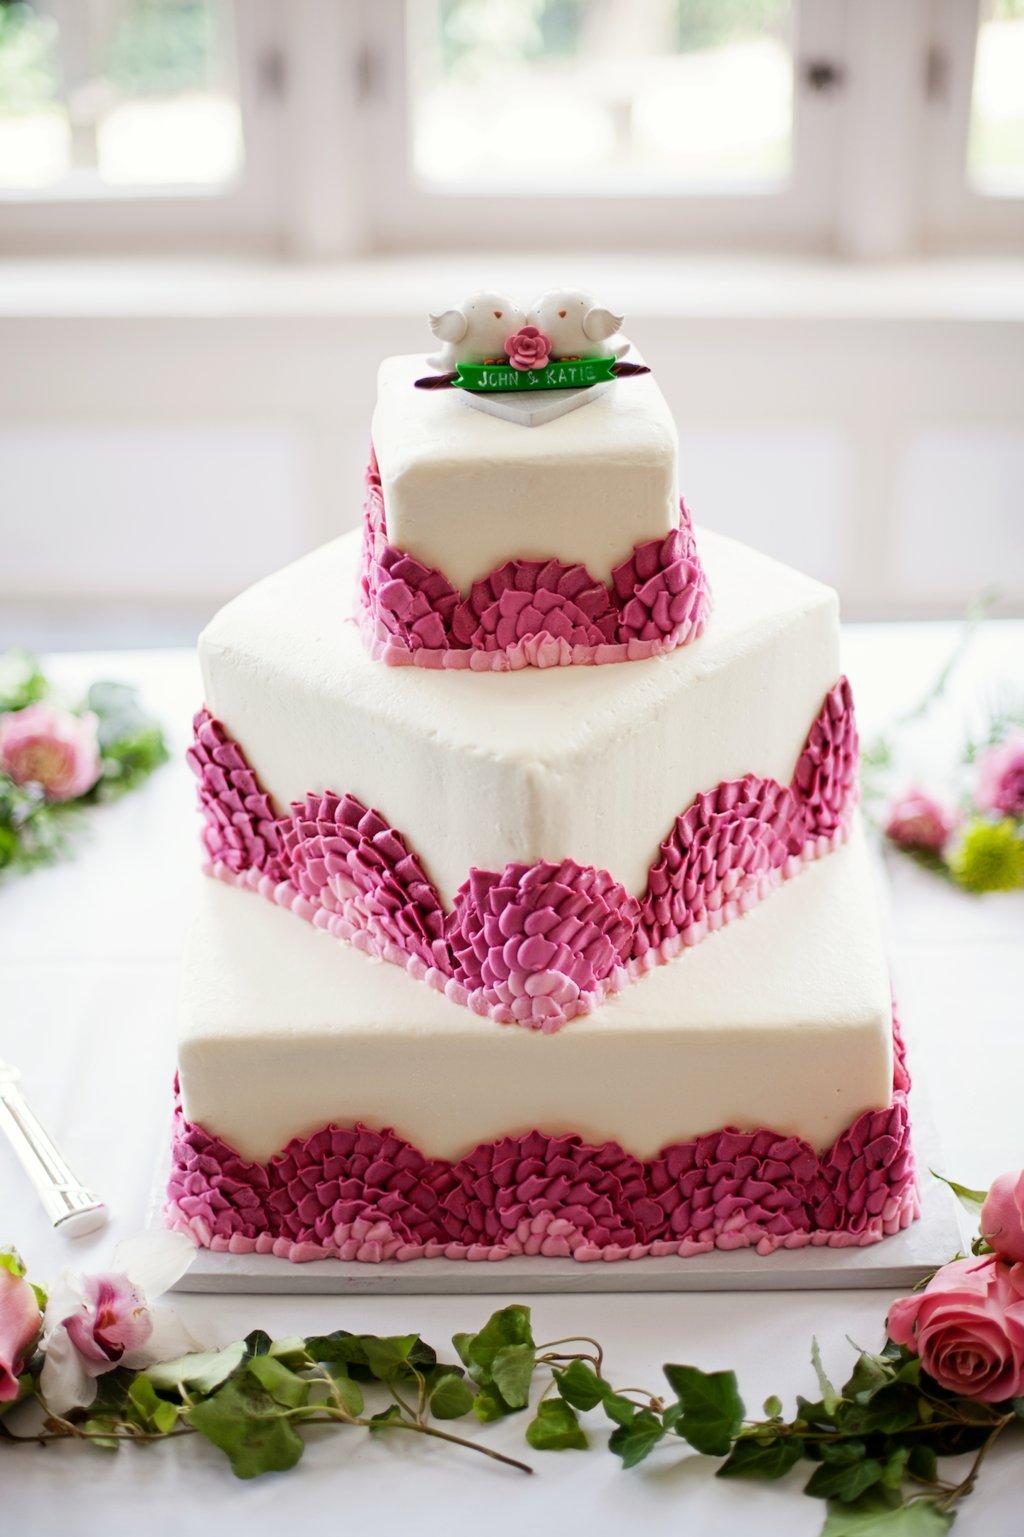 Kansas-city-wedding-photography-white-wedding-cake-ombre-fan-design.full